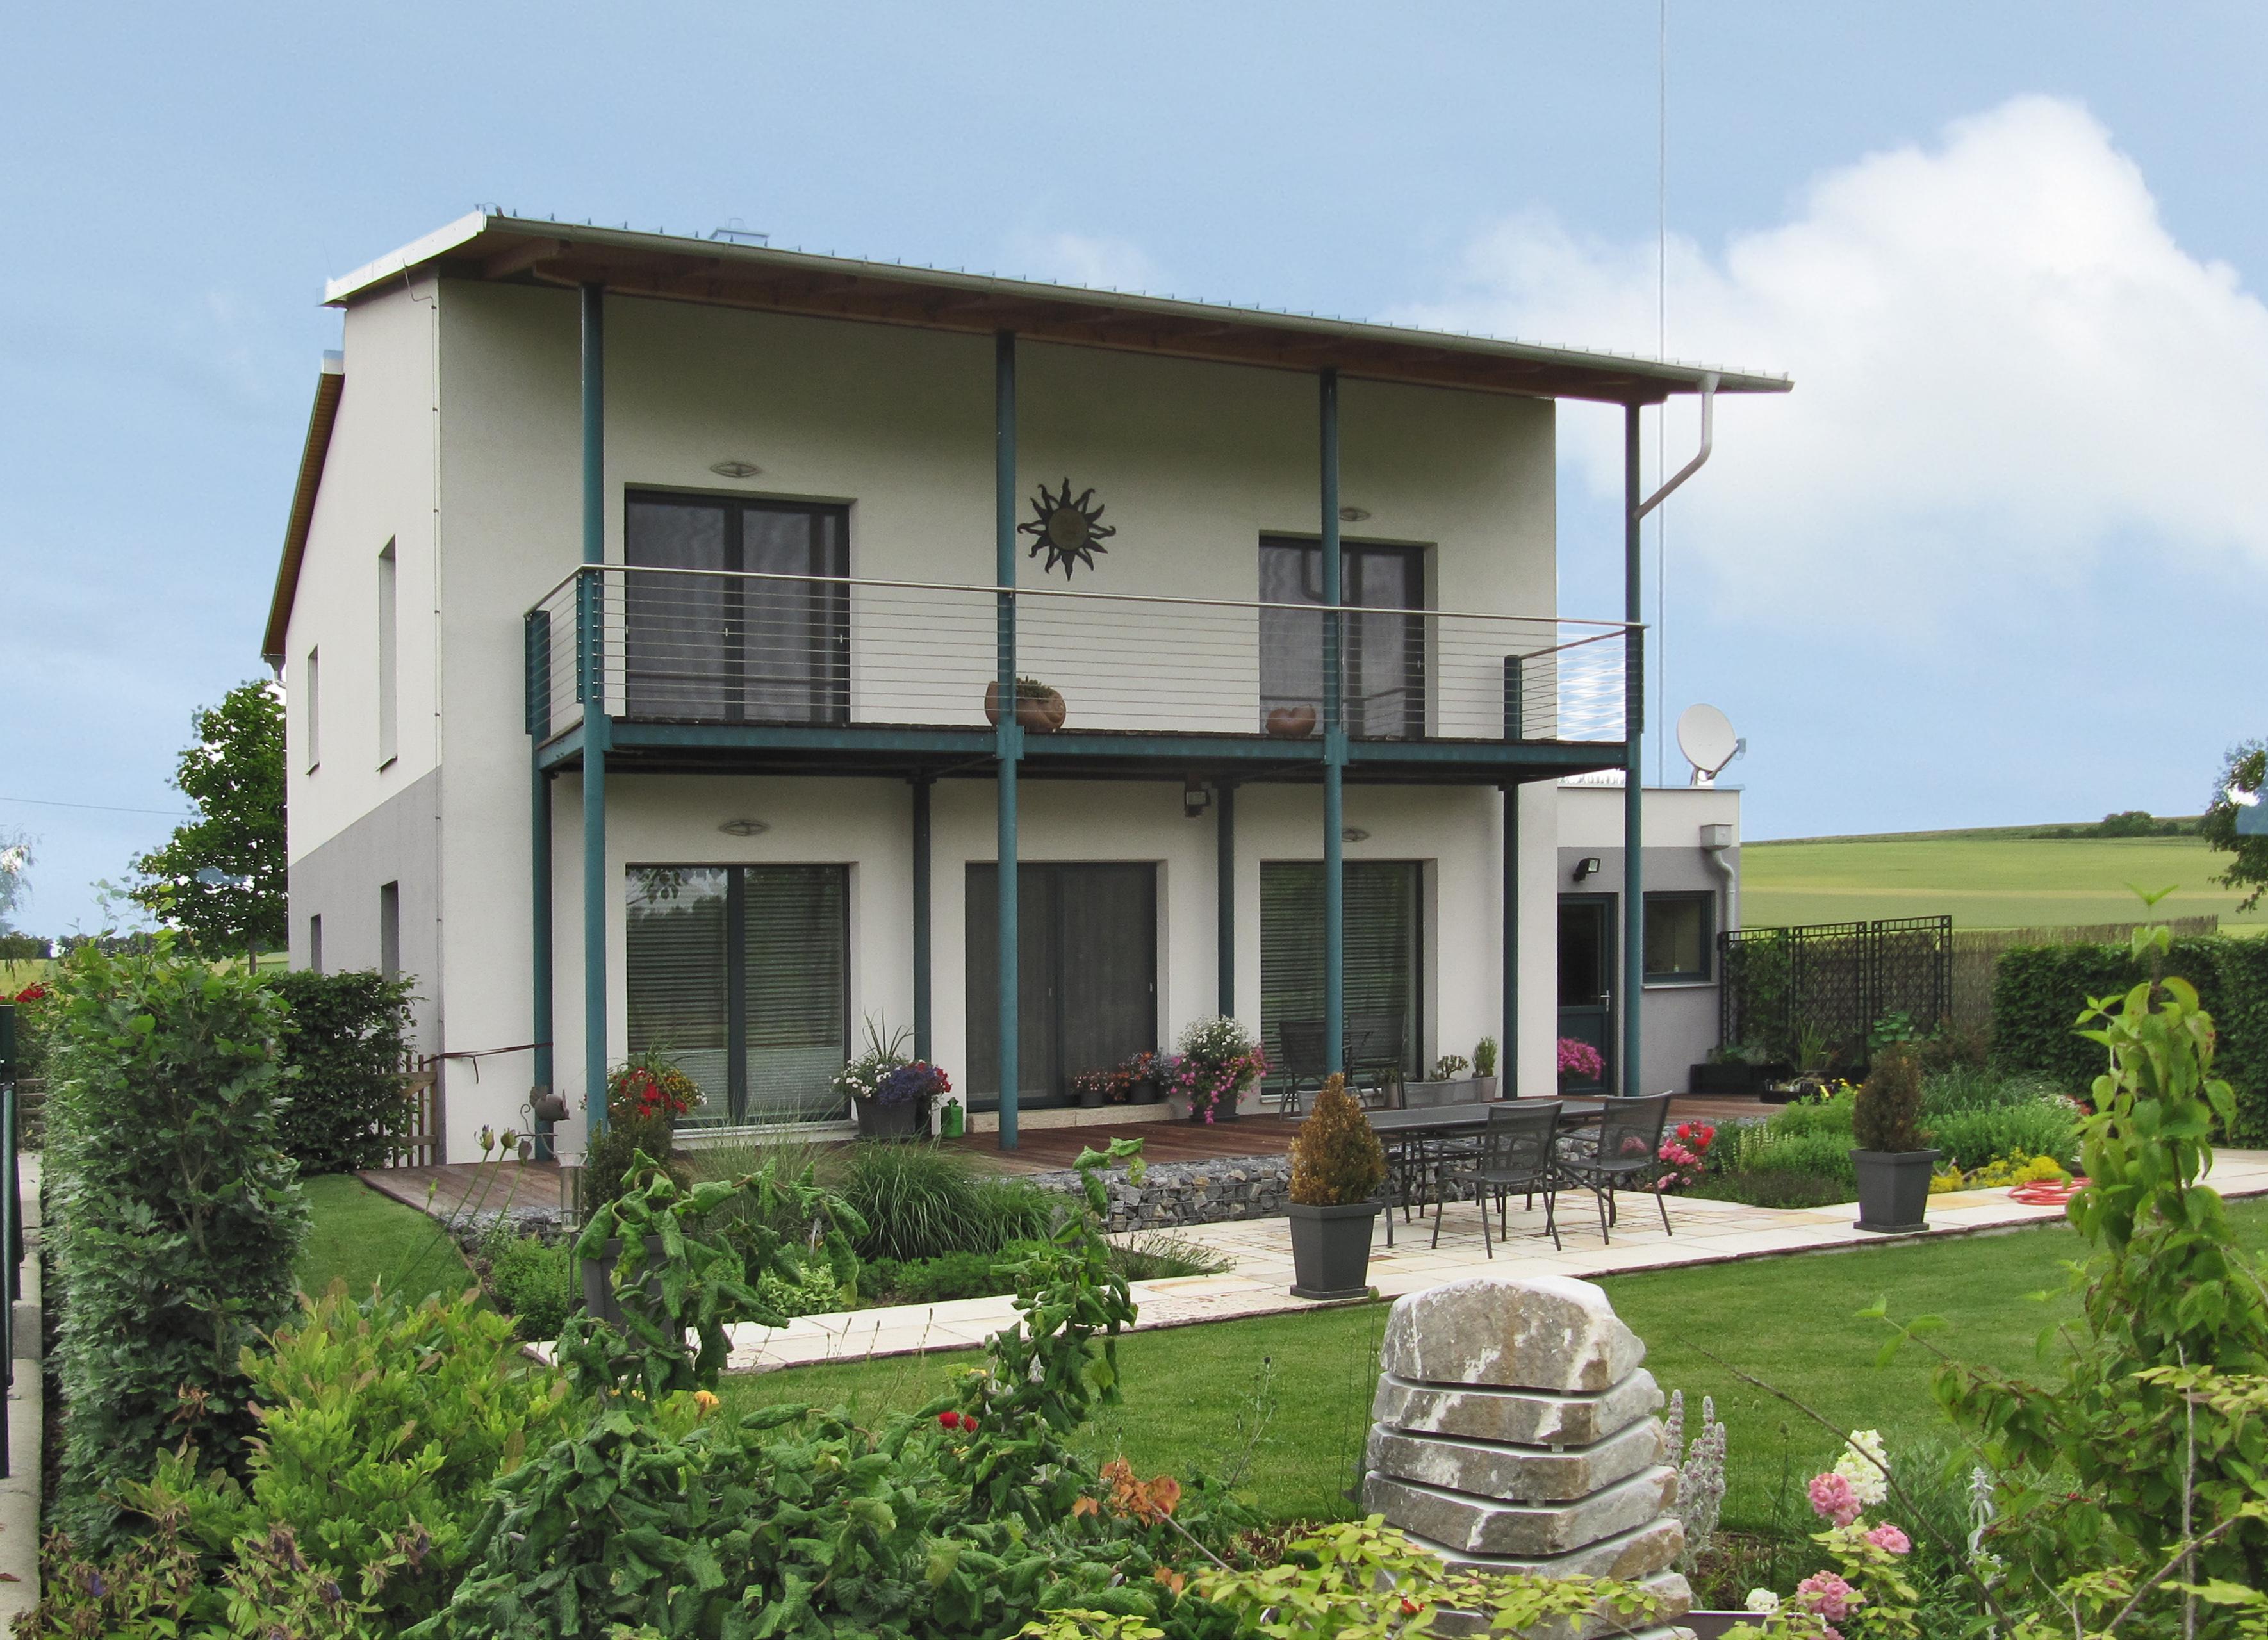 Passivhaus in Ebersdorf